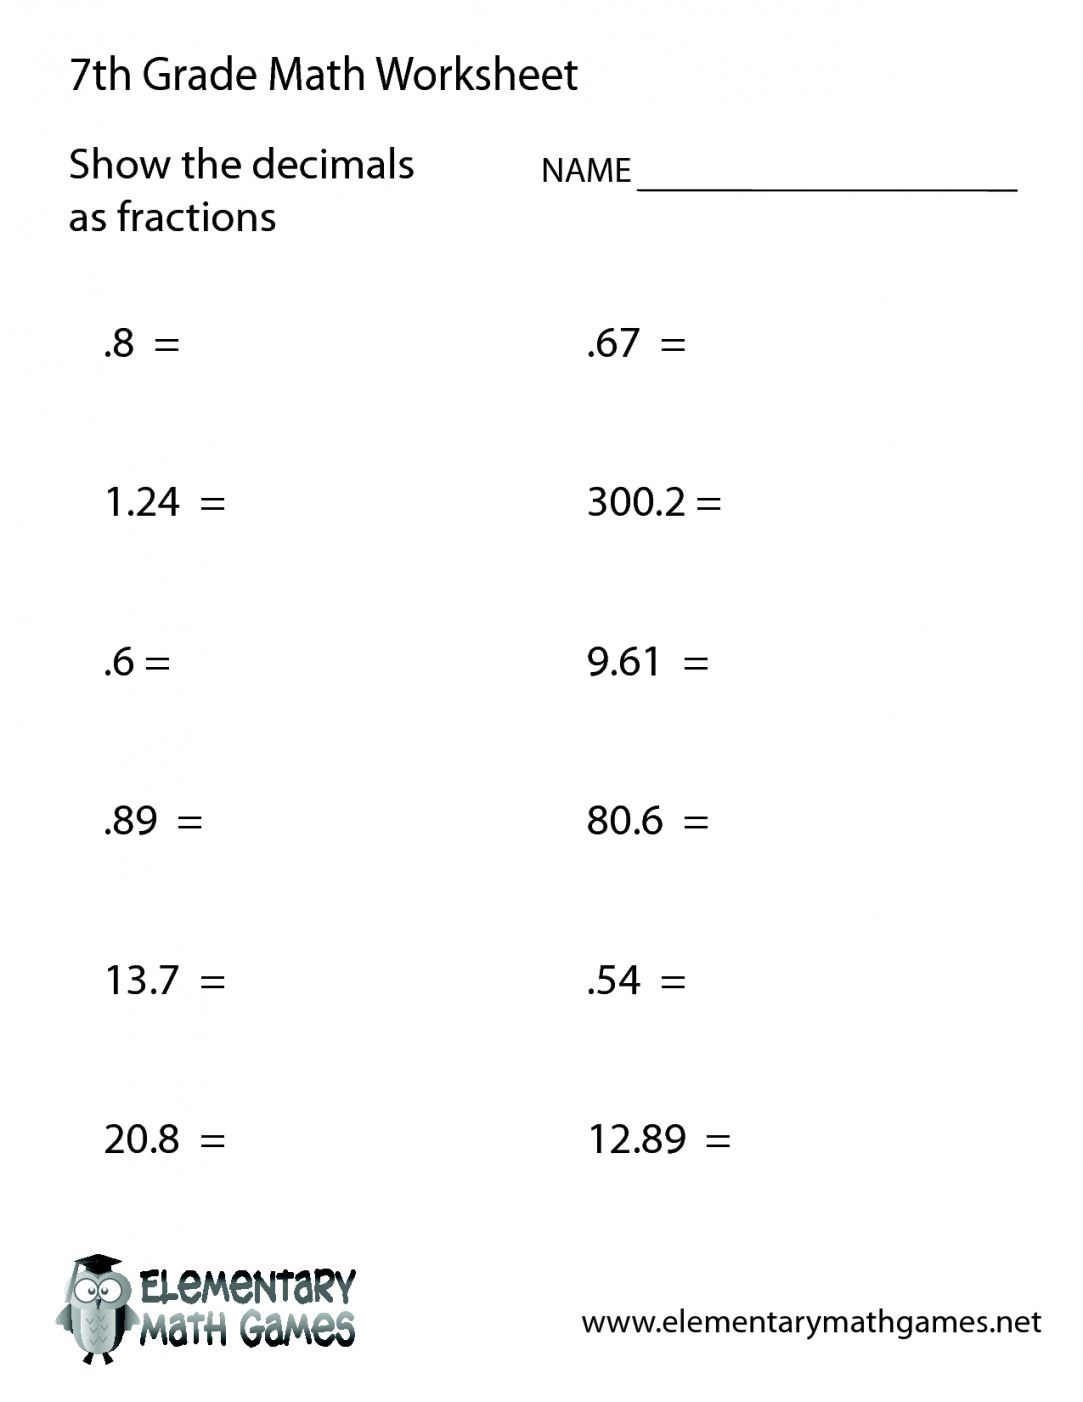 Free Printable 7Th Grade Math Worksheets | Lostranquillos - Free | Free Printable 7Th Grade Math Worksheets